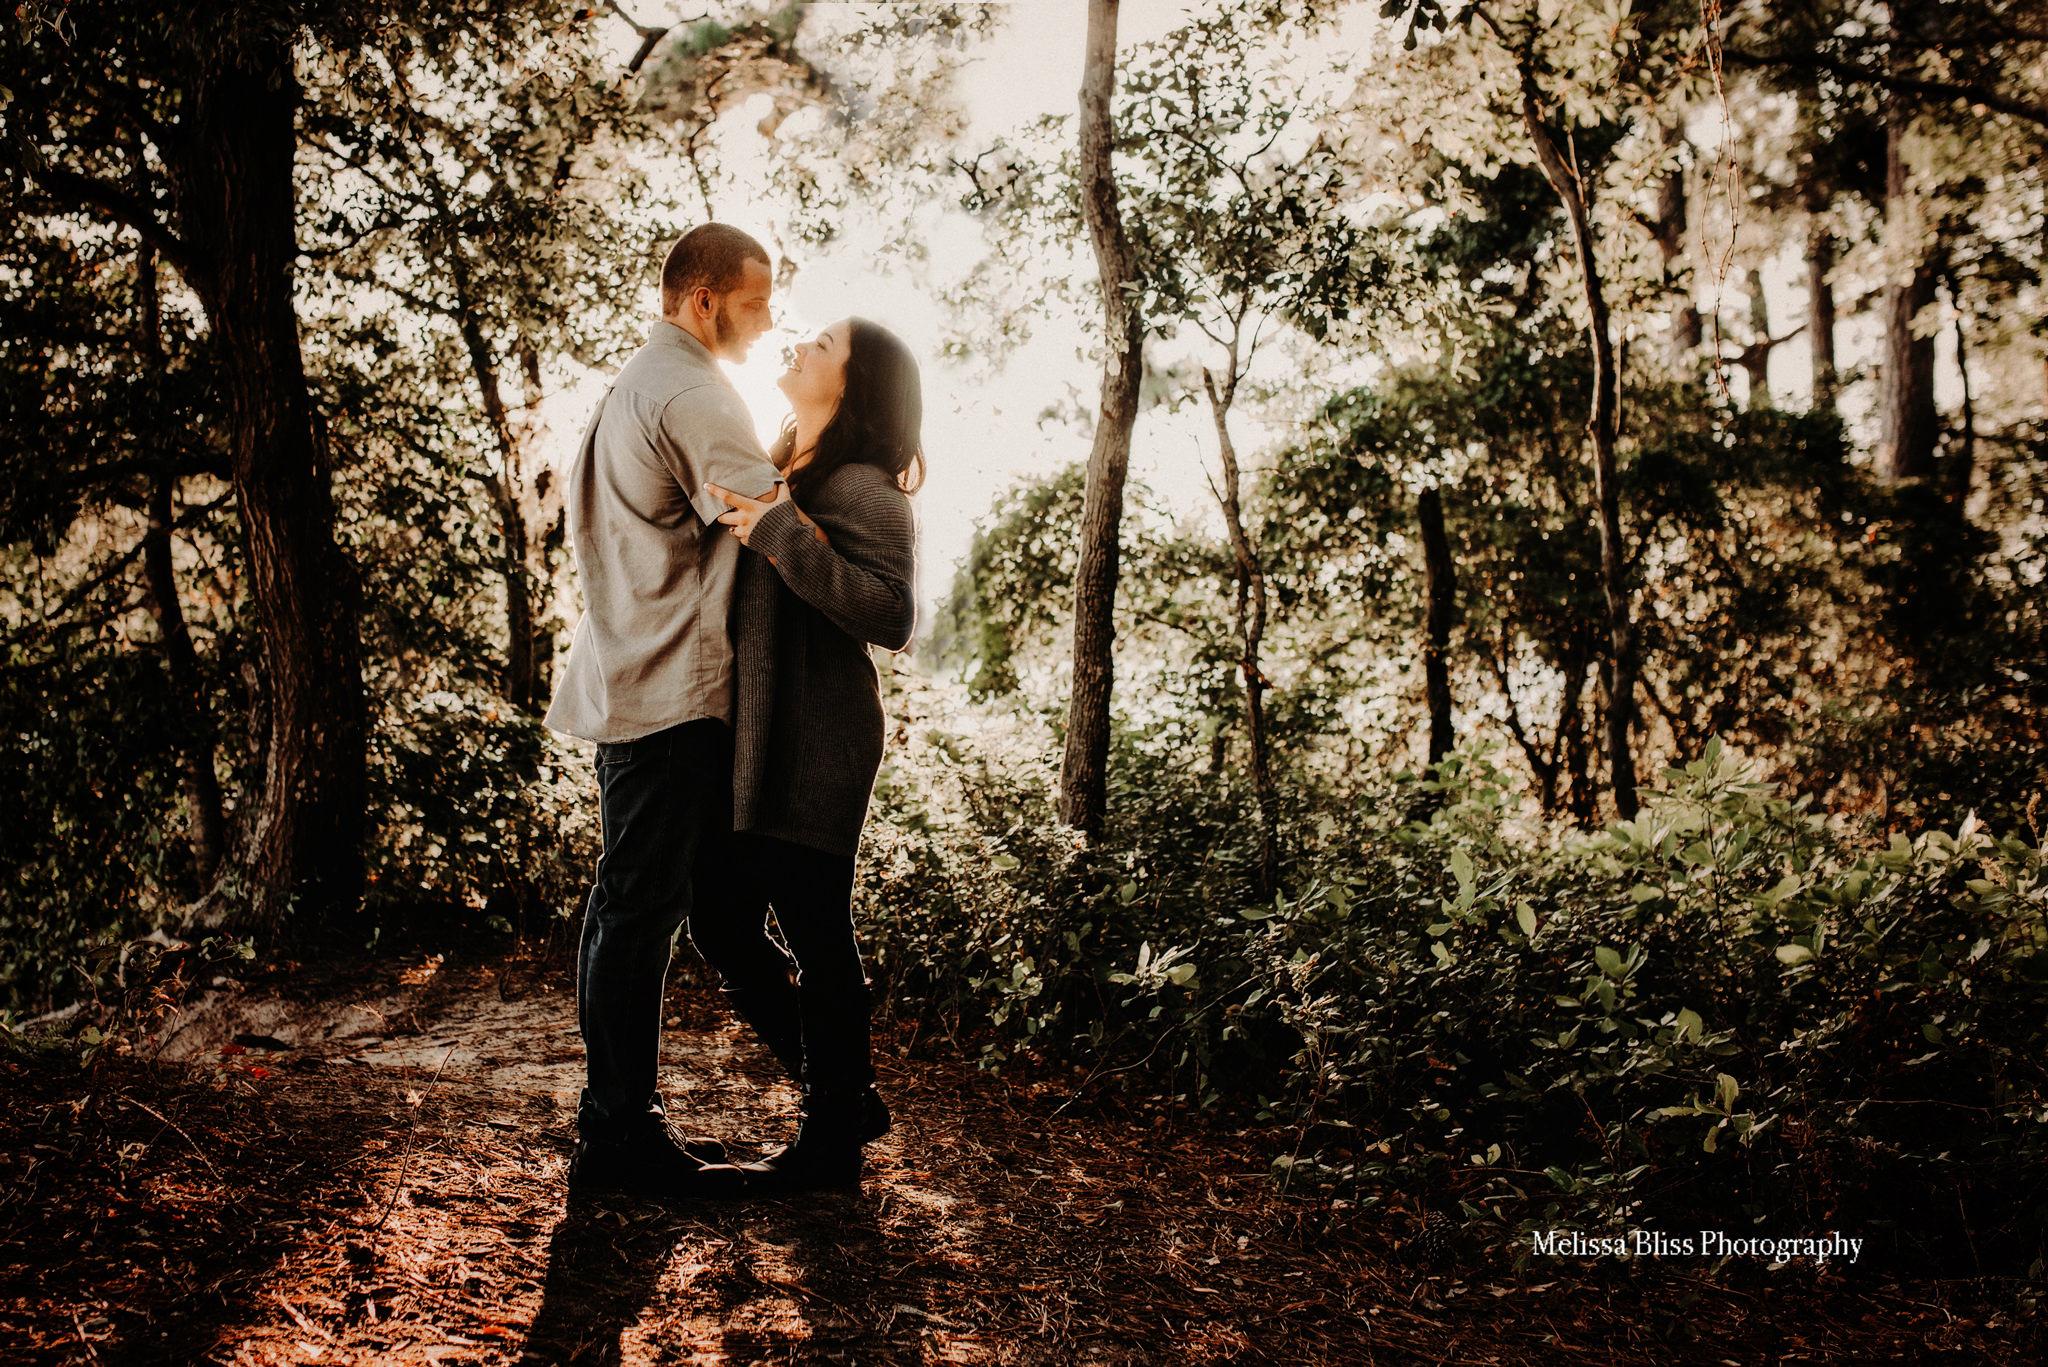 norfolk-engagement-photographer-melissa-bliss-photography-destination-wedding-photographer-virginia-beach-wedding-photographer.jpg